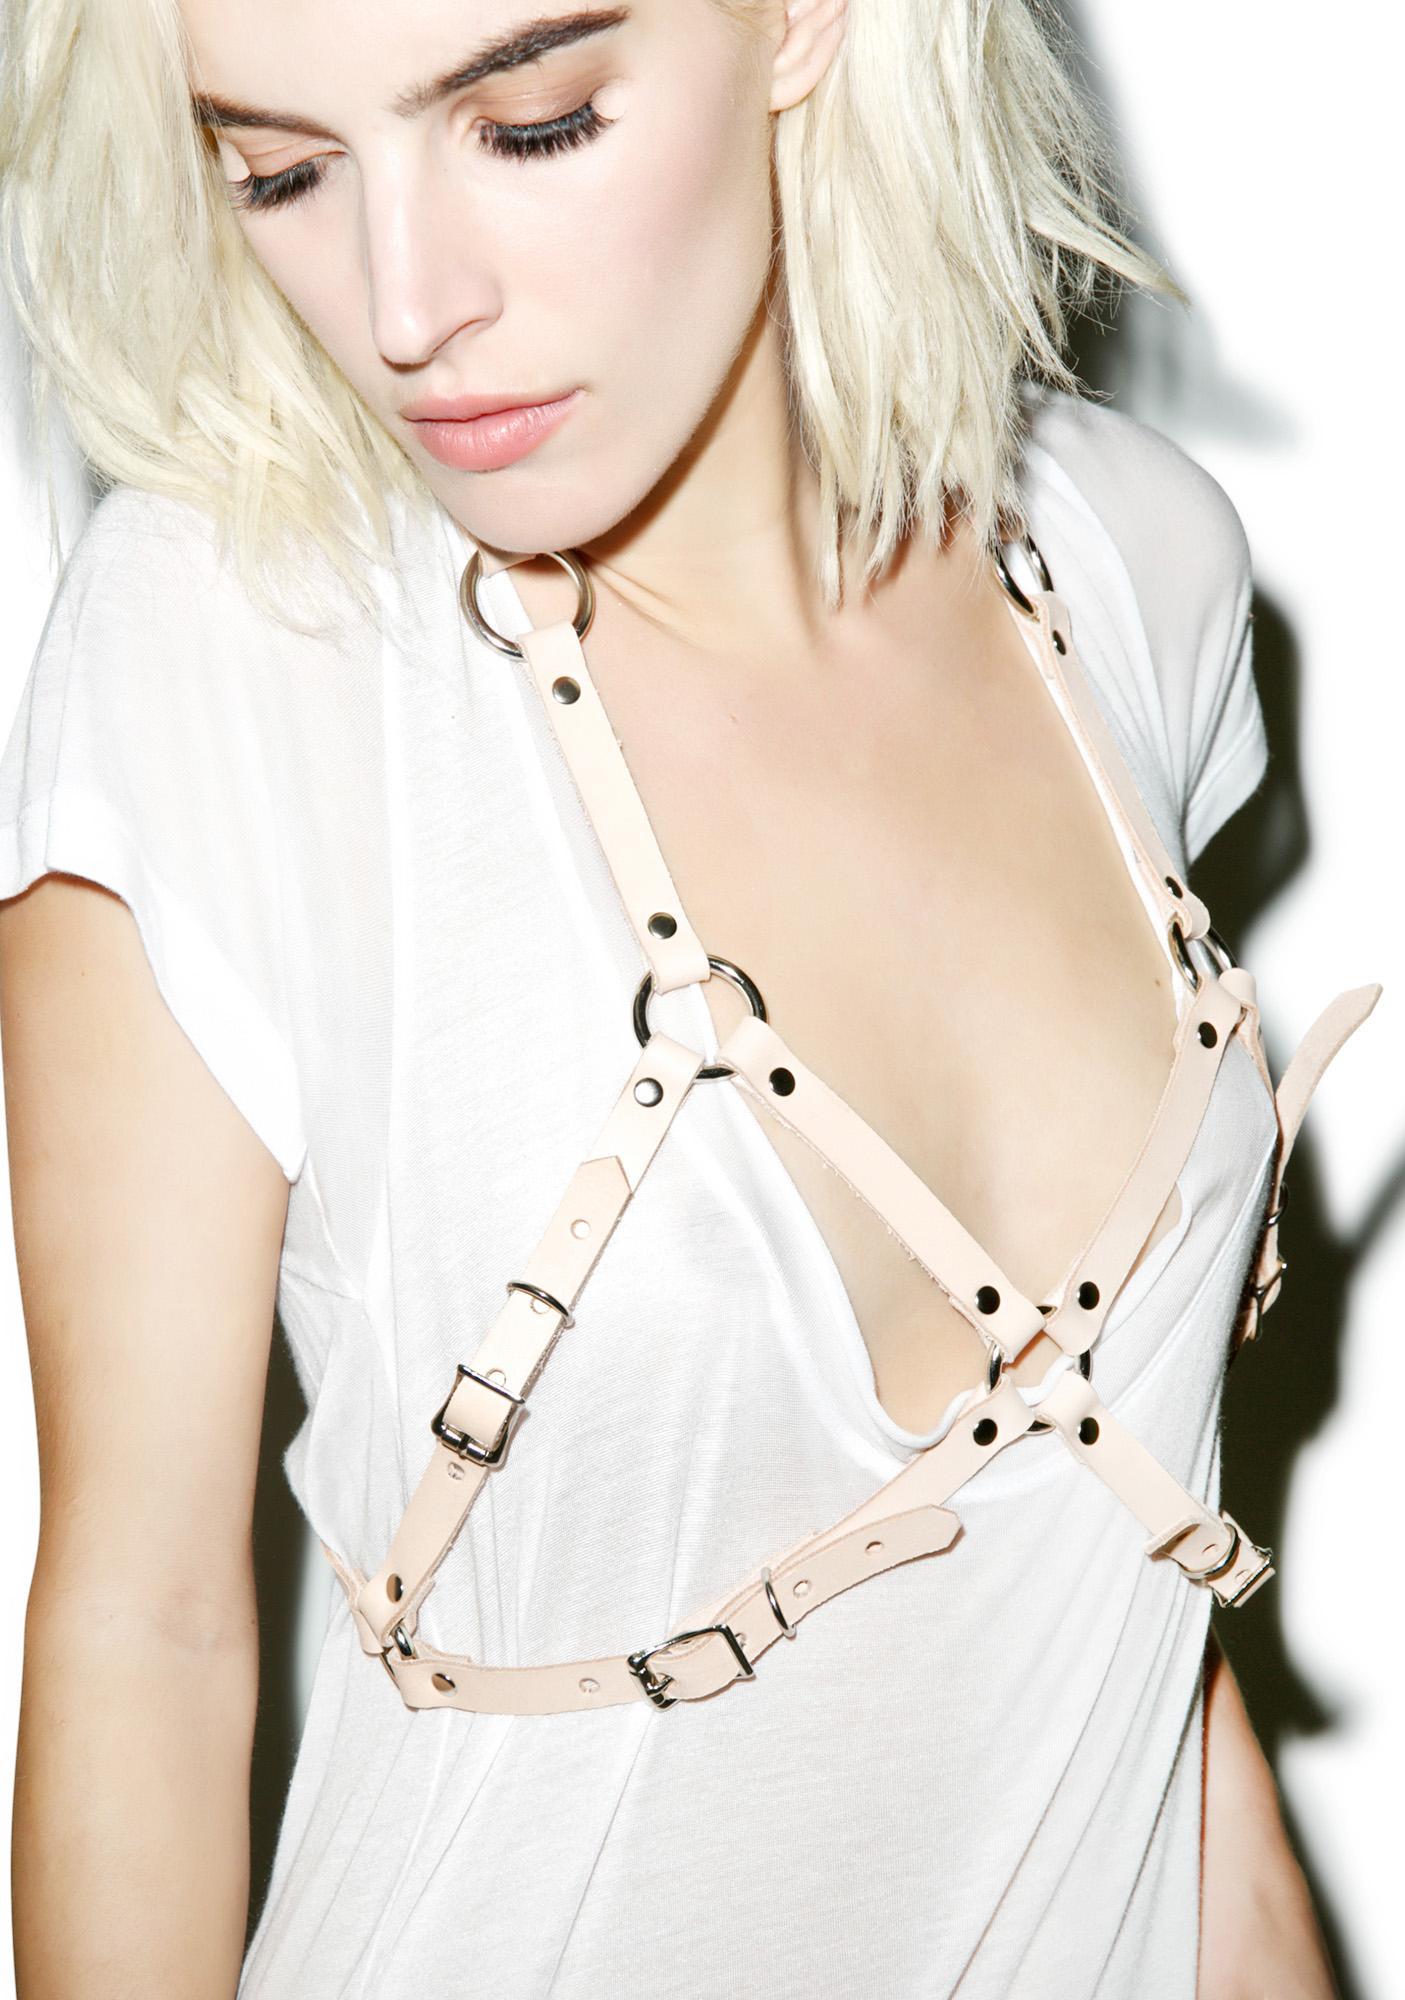 Club Exx Nude 'Tude Buckled Bra Harness